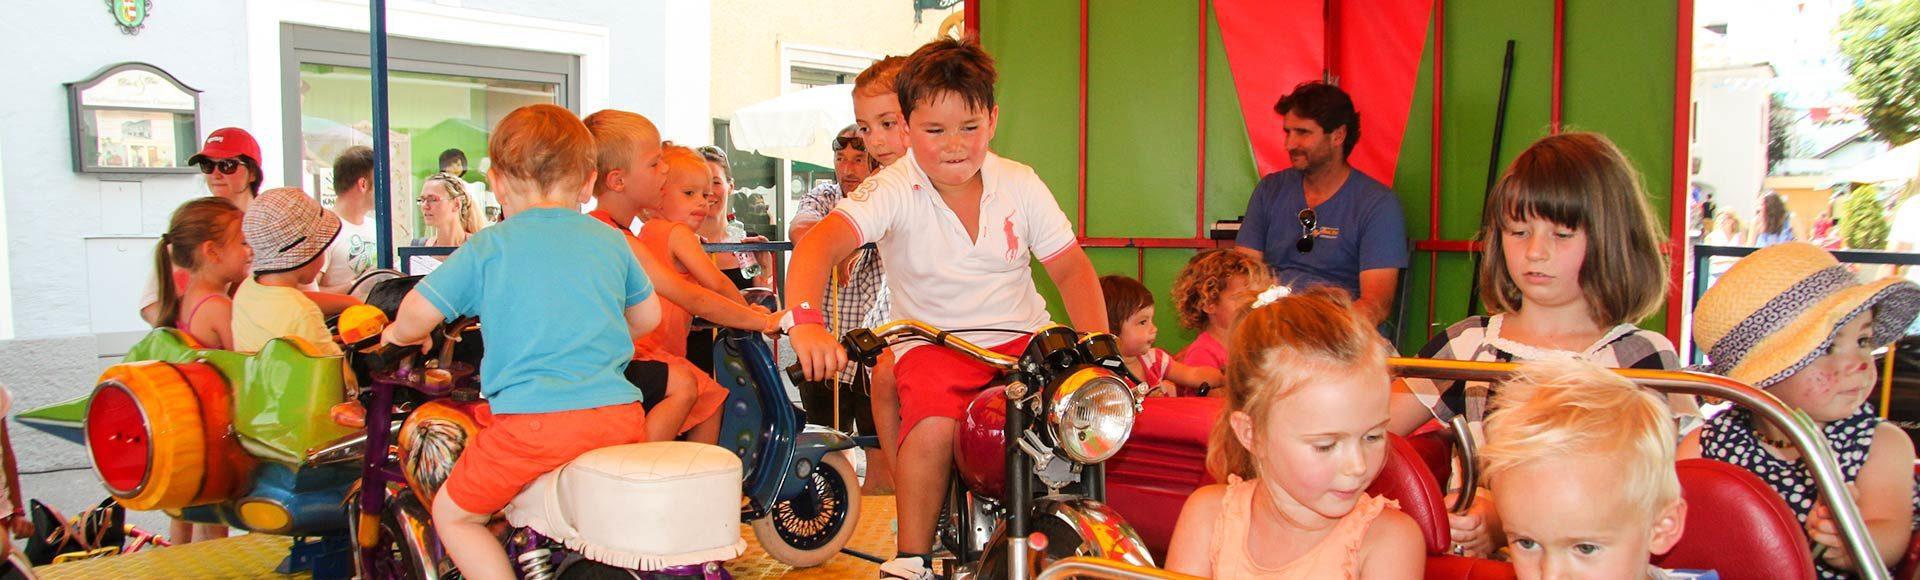 Kinderfest Tourismusverband Radstadt 4